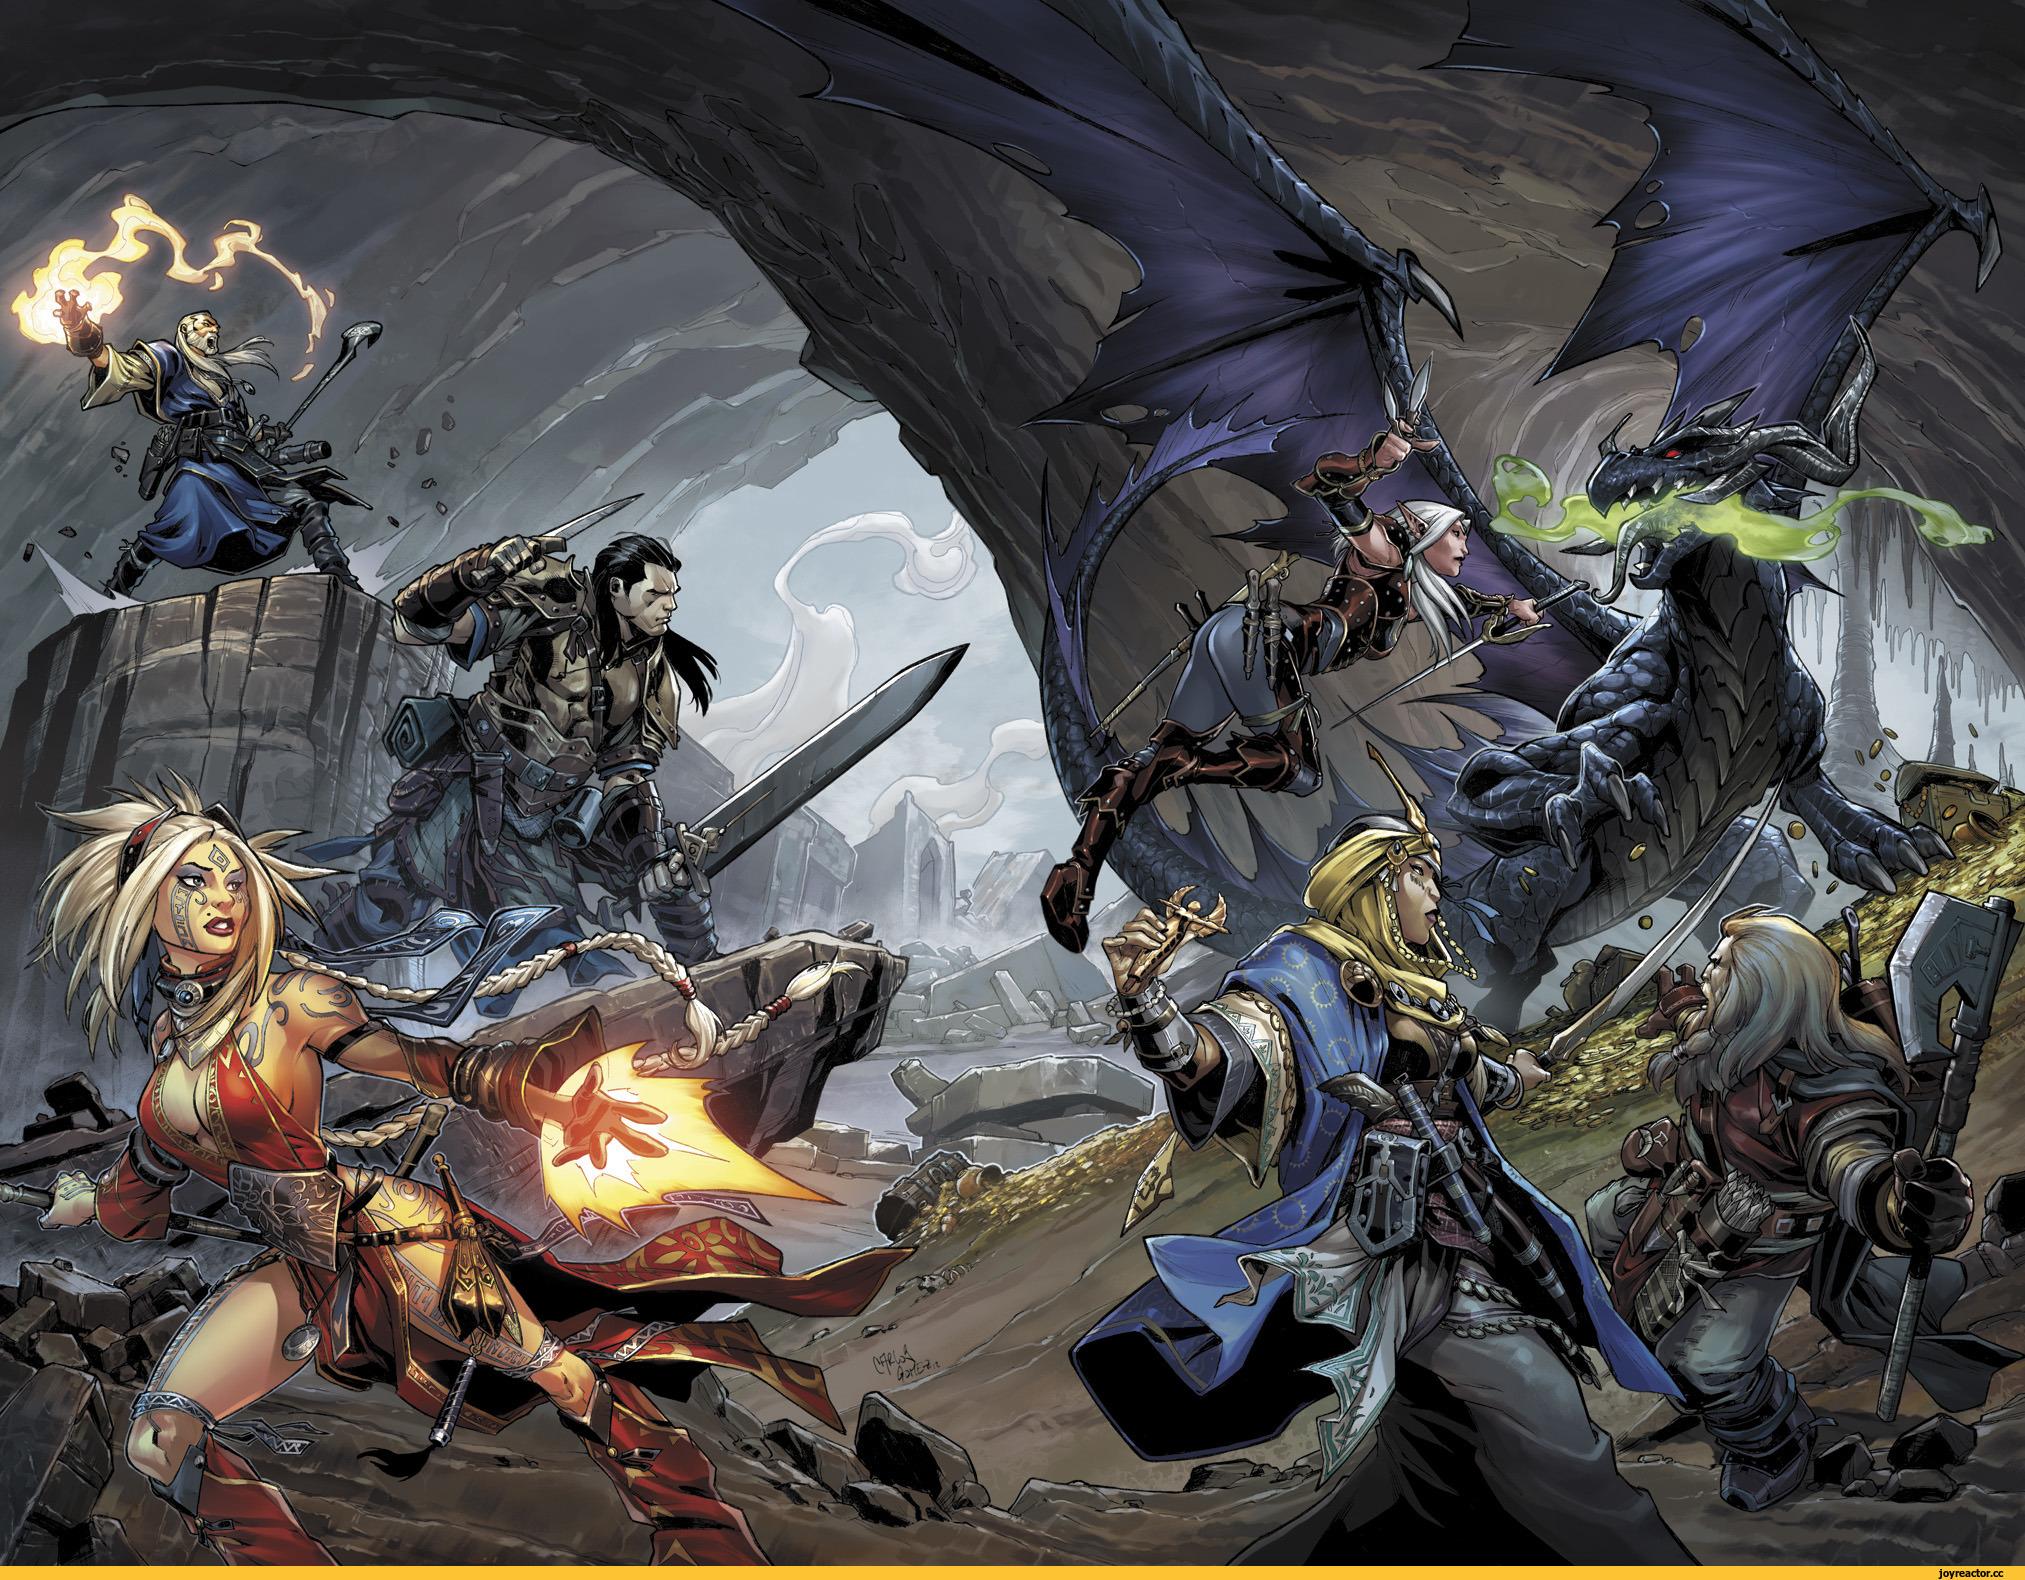 Преследование dungeons & dragons в 1980-х